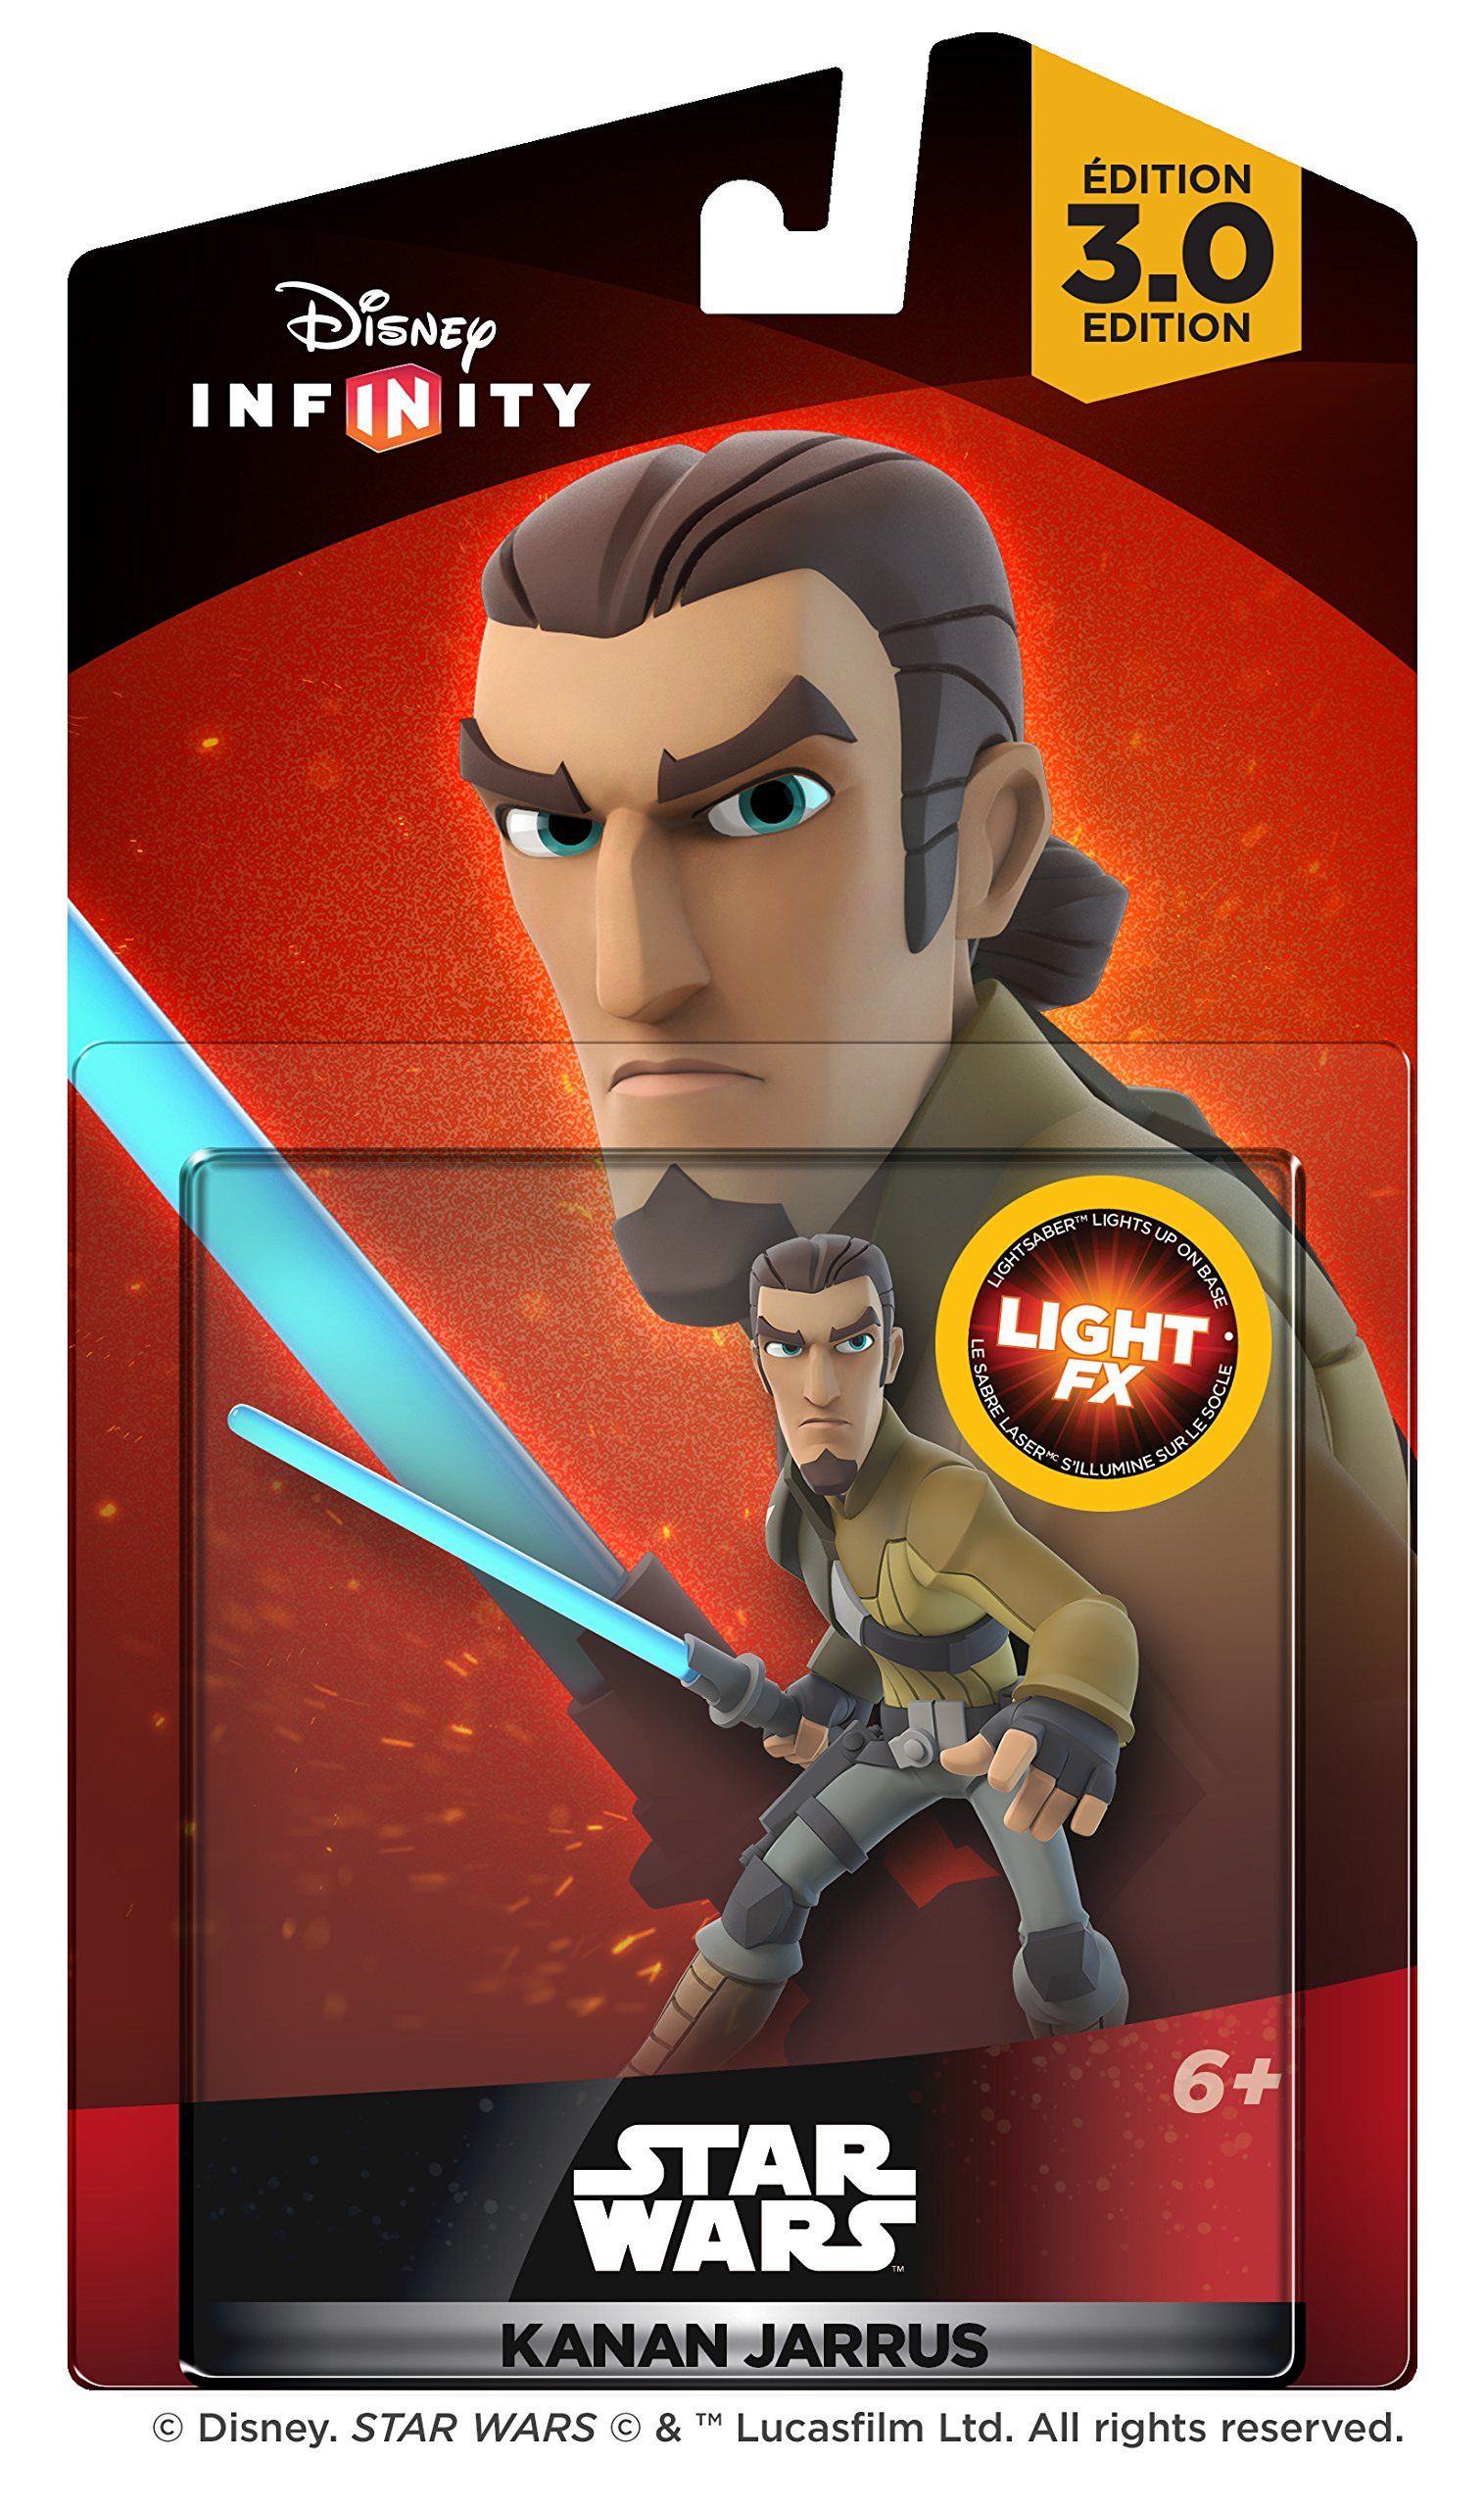 Disney Infinity 3.0 Edition: Star Wars Kanan Jarrus Light FX Figure - Amazon Exclusive